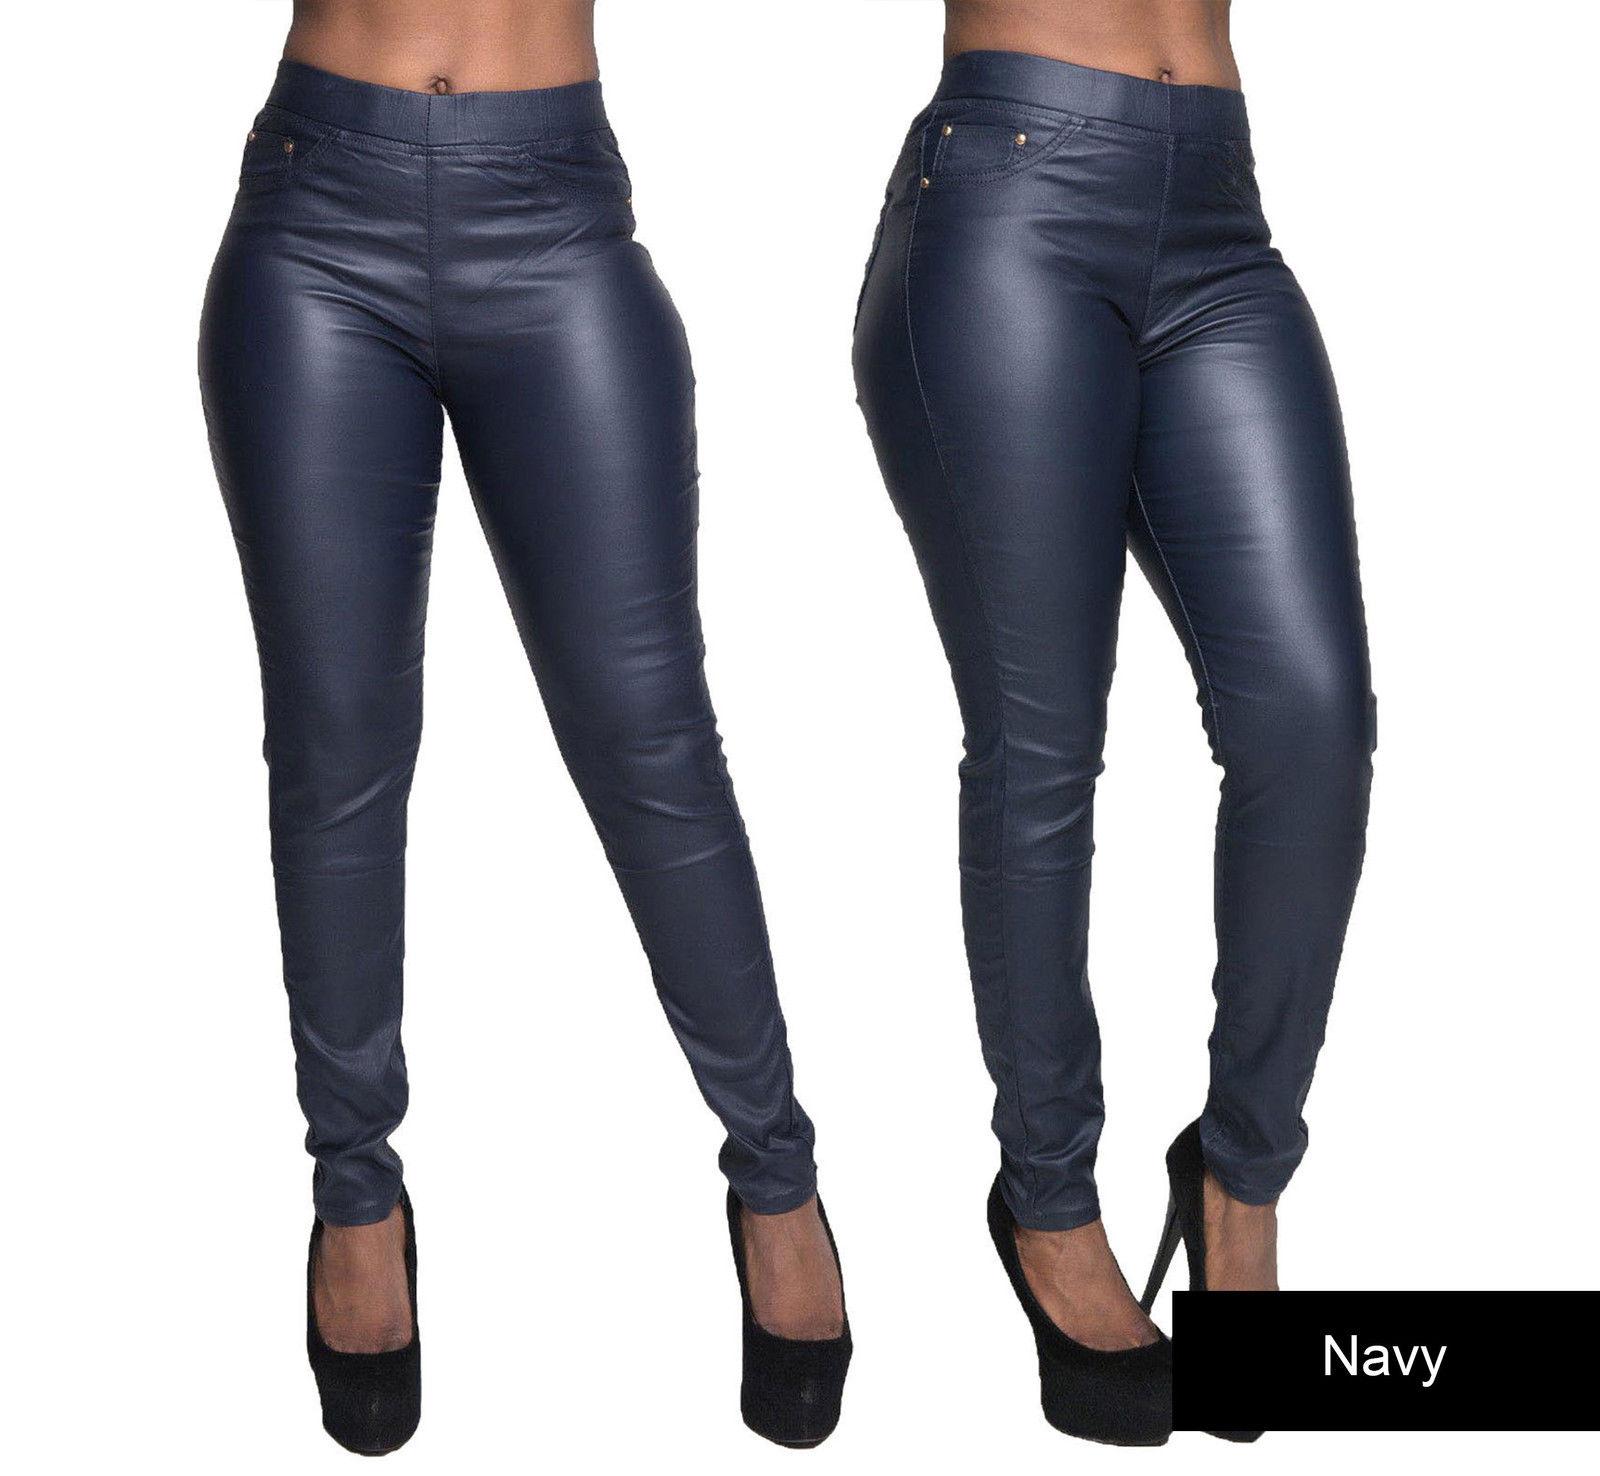 damen frauen lederoptik leggings wetlook hosen slim jeans. Black Bedroom Furniture Sets. Home Design Ideas